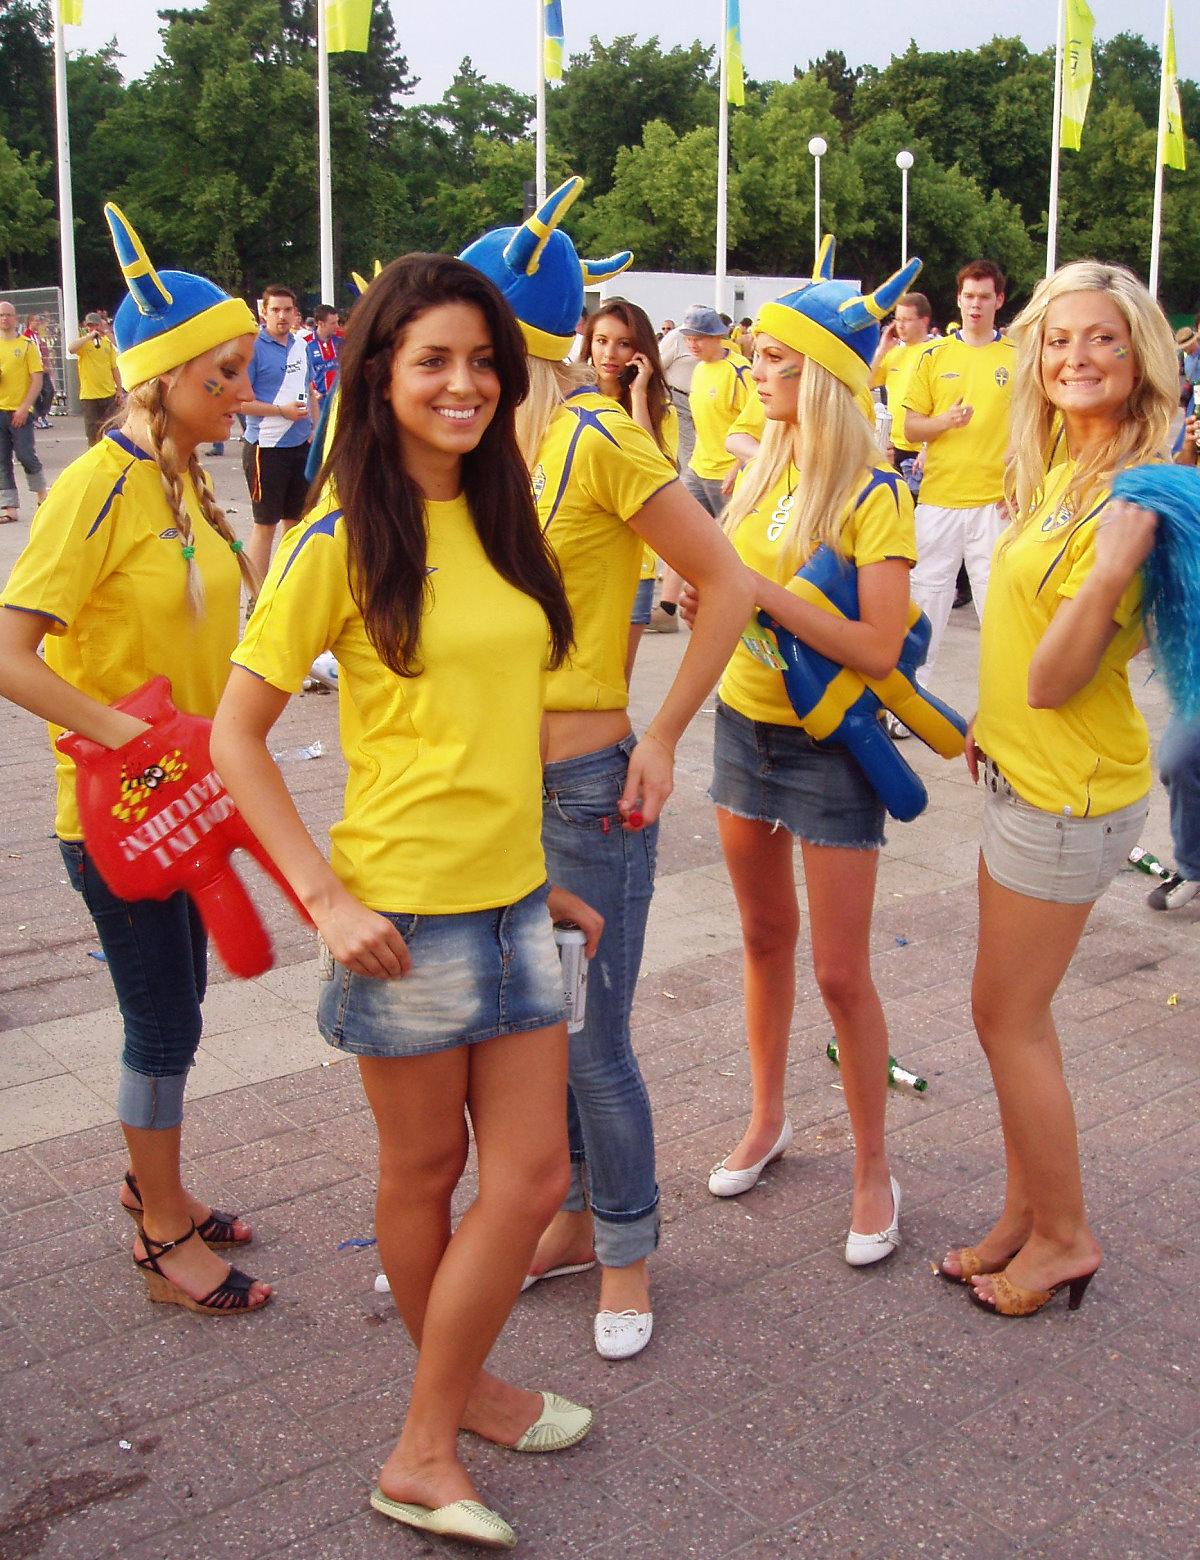 http://3.bp.blogspot.com/-cbga3tIq_O0/TcFH5RIC6oI/AAAAAAAABVY/QLaOKi5B0bc/s1600/swedish_girls_01.jpeg